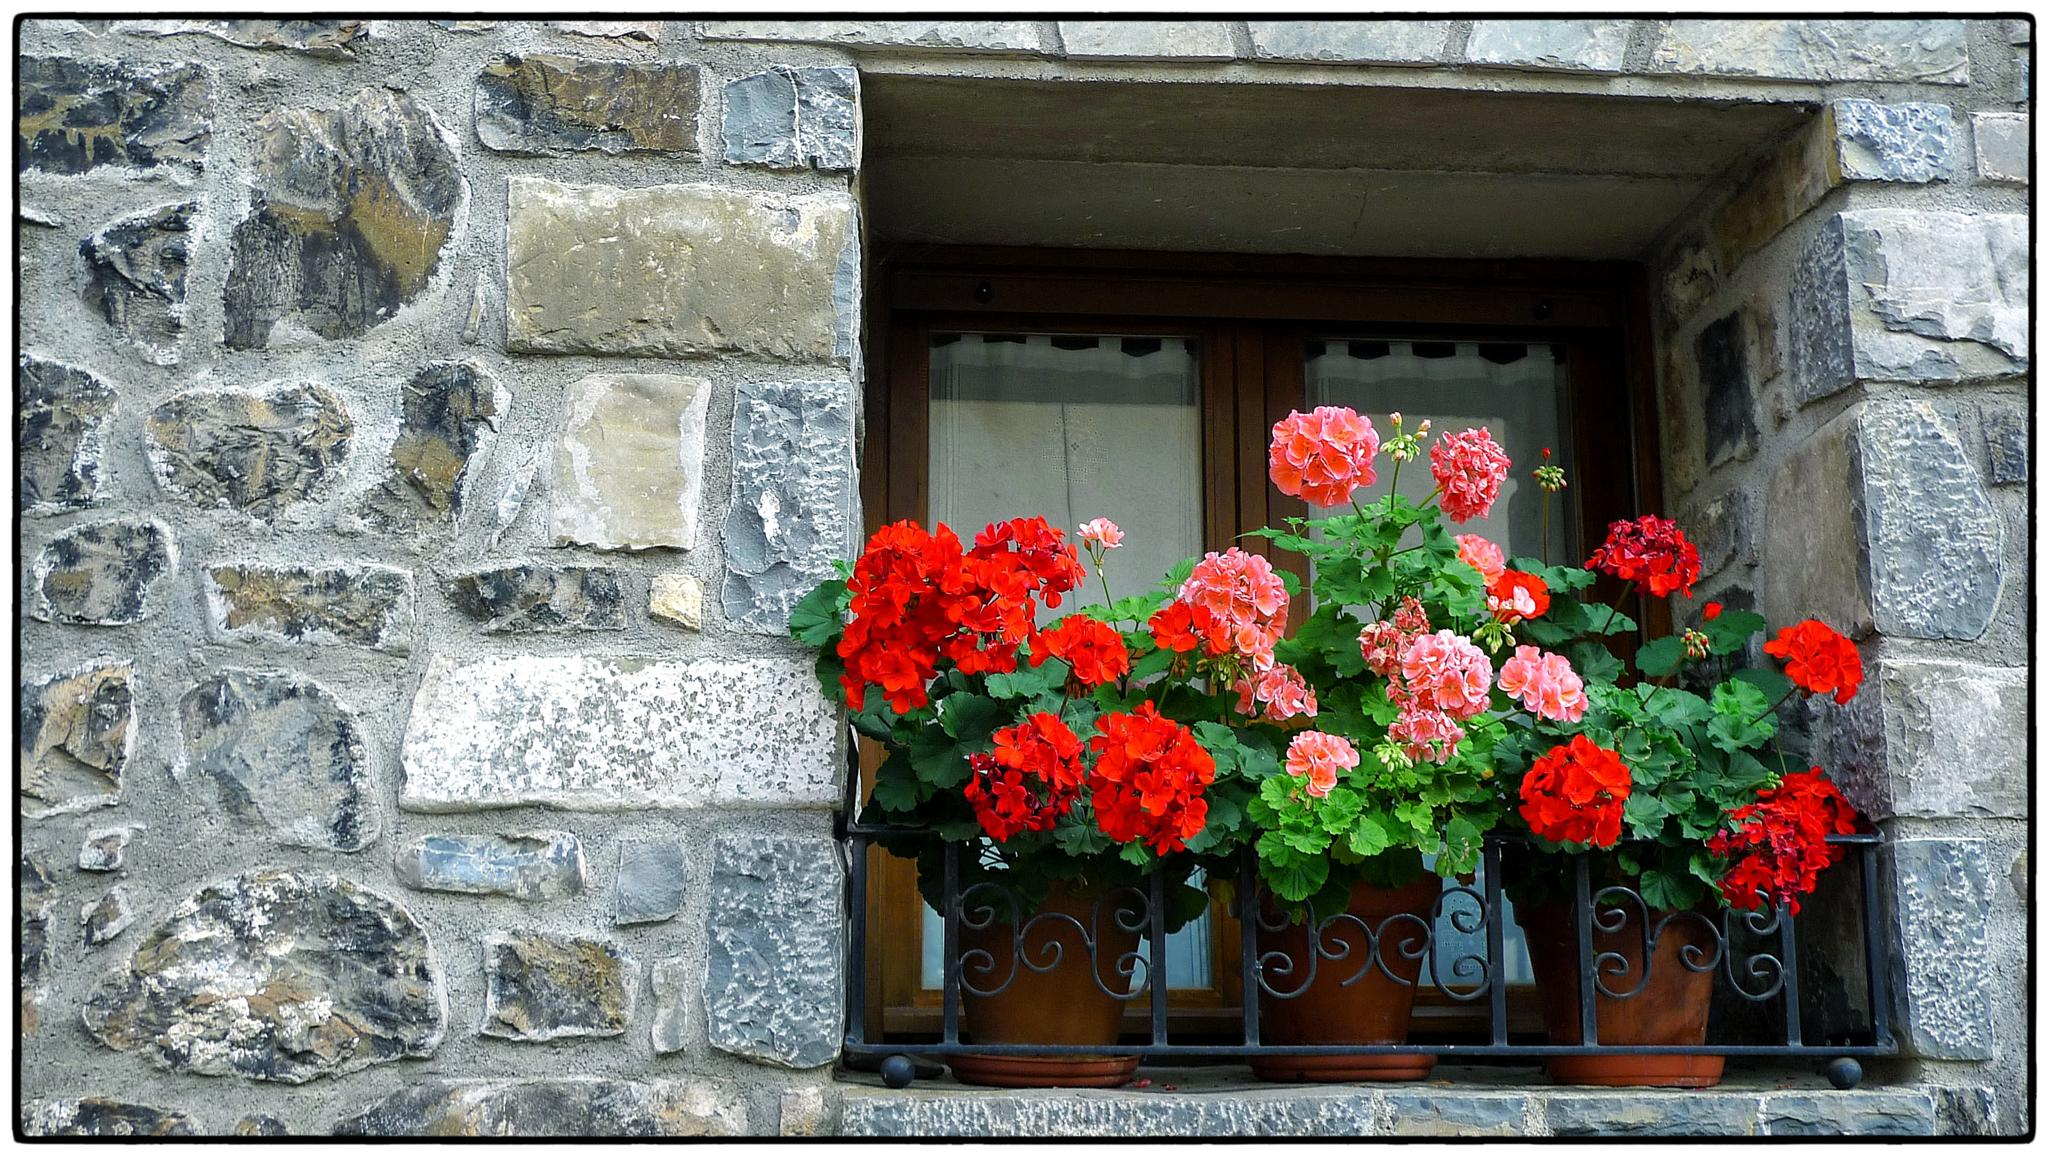 Geranis a la finestra. Hecho (Huesca) by bescosx